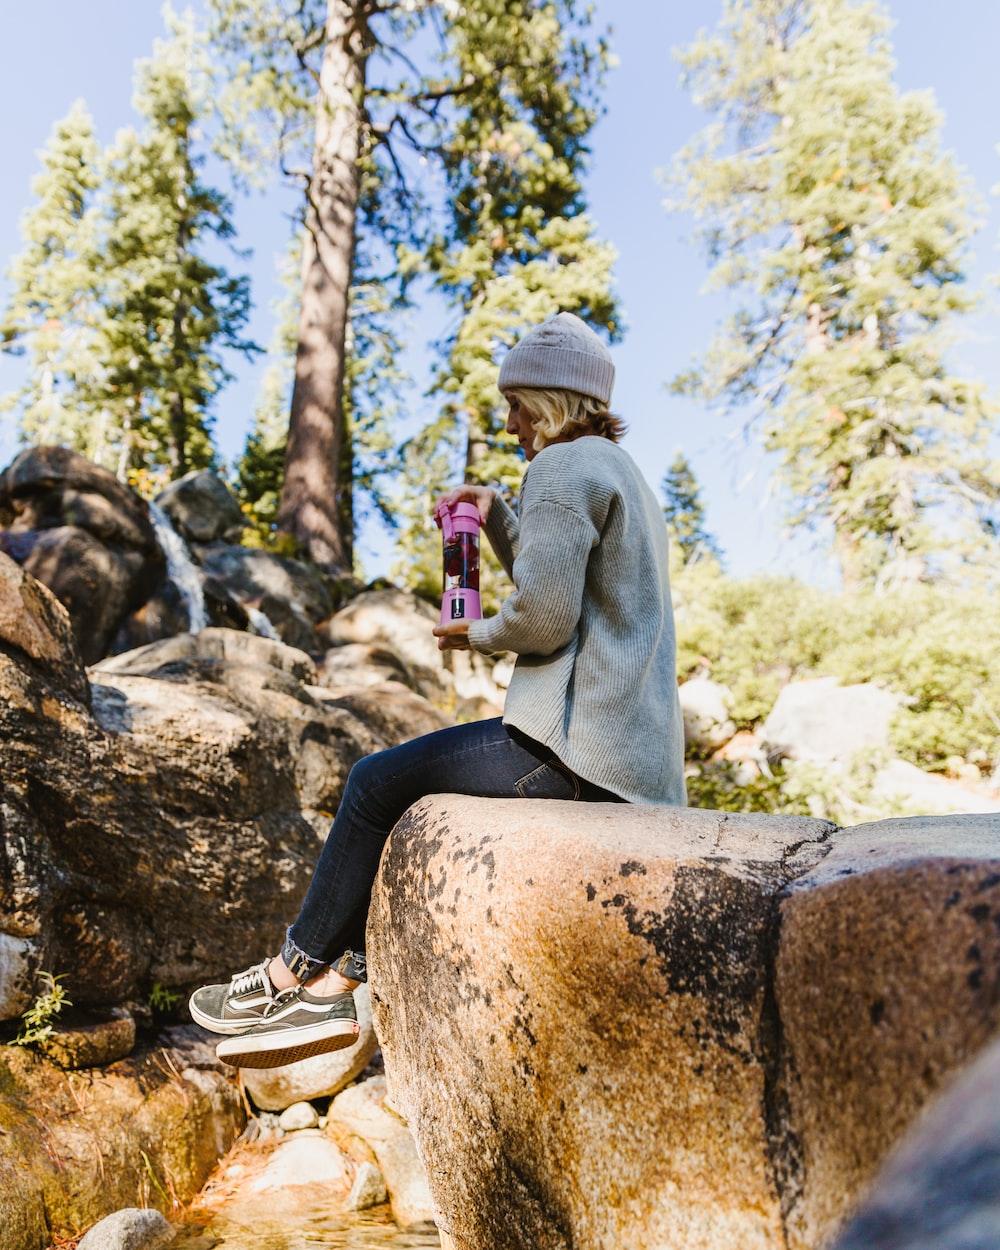 woman sitting on rock while holding blender tumbler